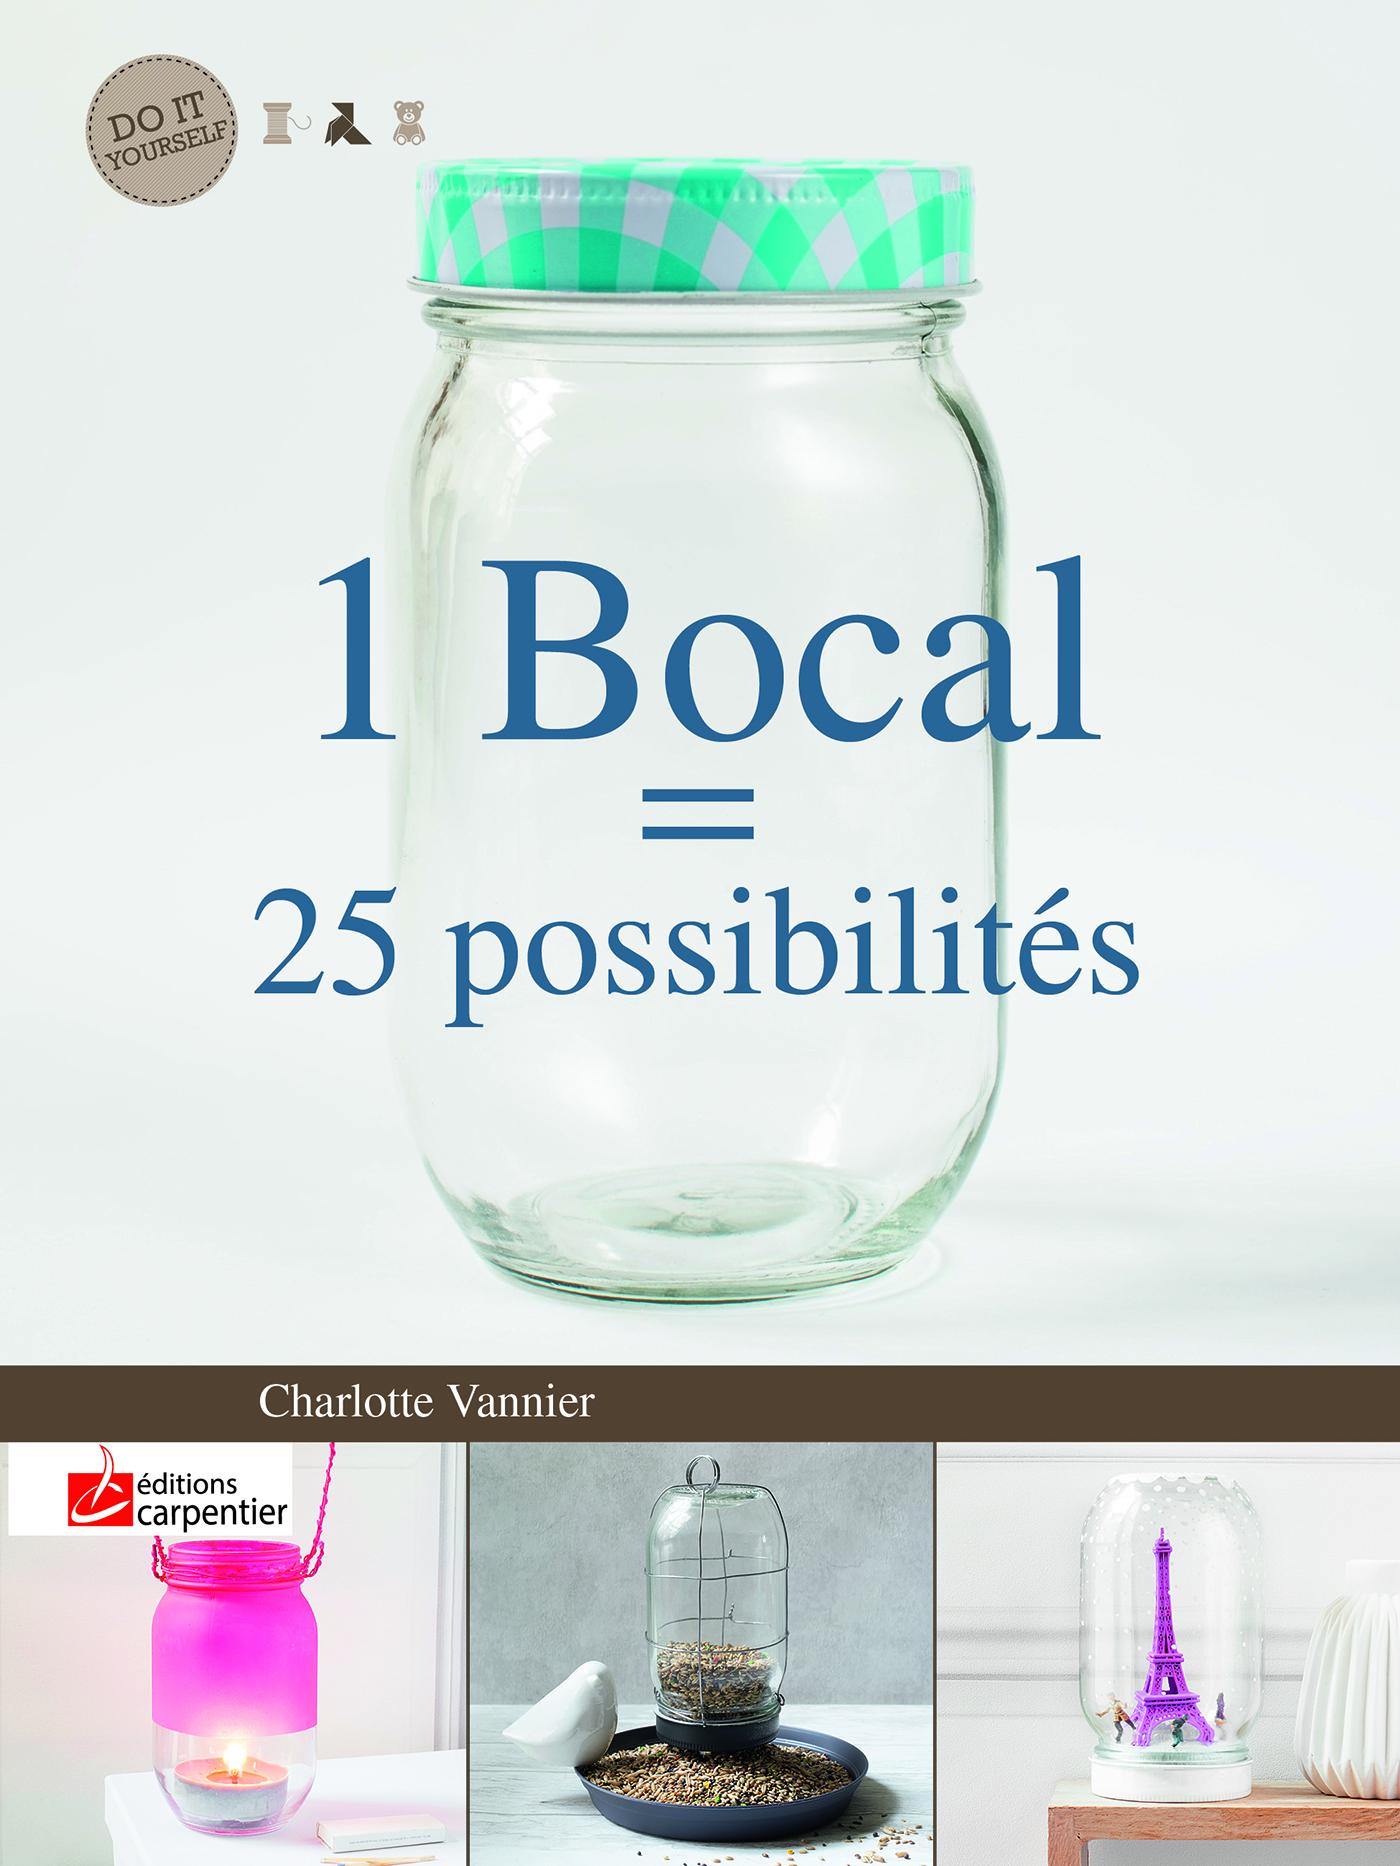 1 BOCAL = 25 POSSIBILITES